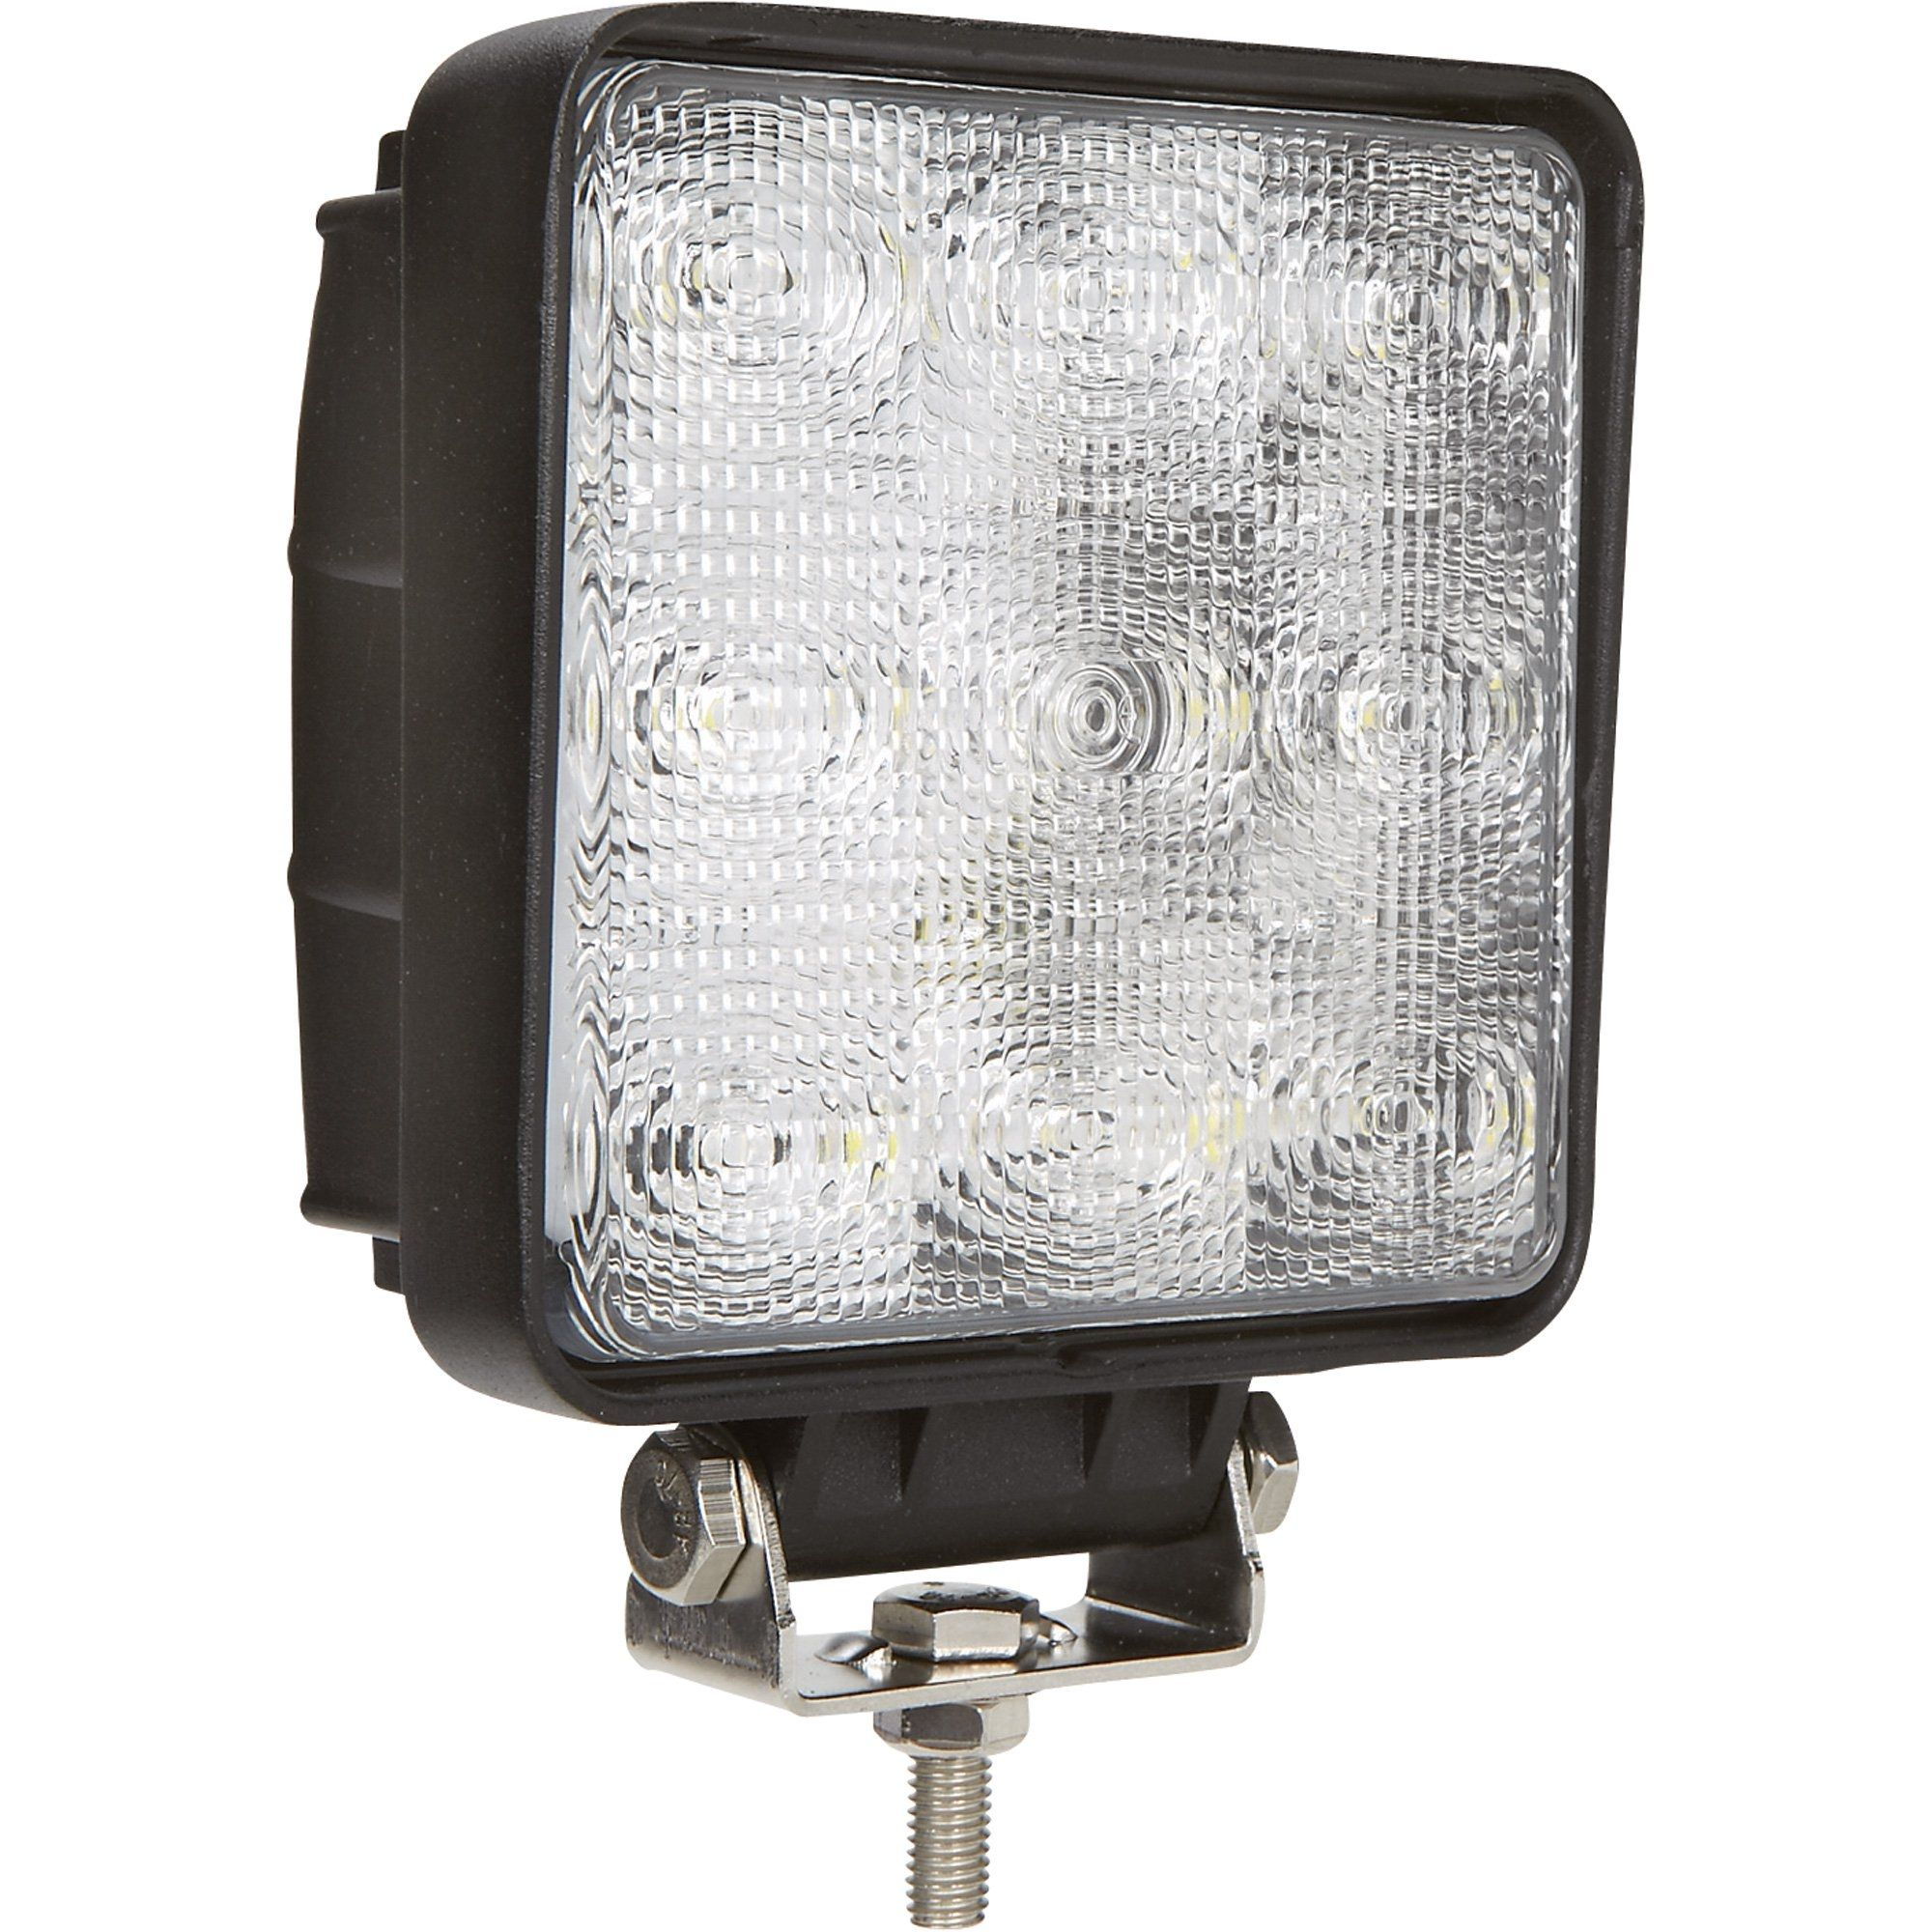 12 volt led flood light fixtures httpscartclub pinterest 12 volt led flood light fixtures arubaitofo Image collections